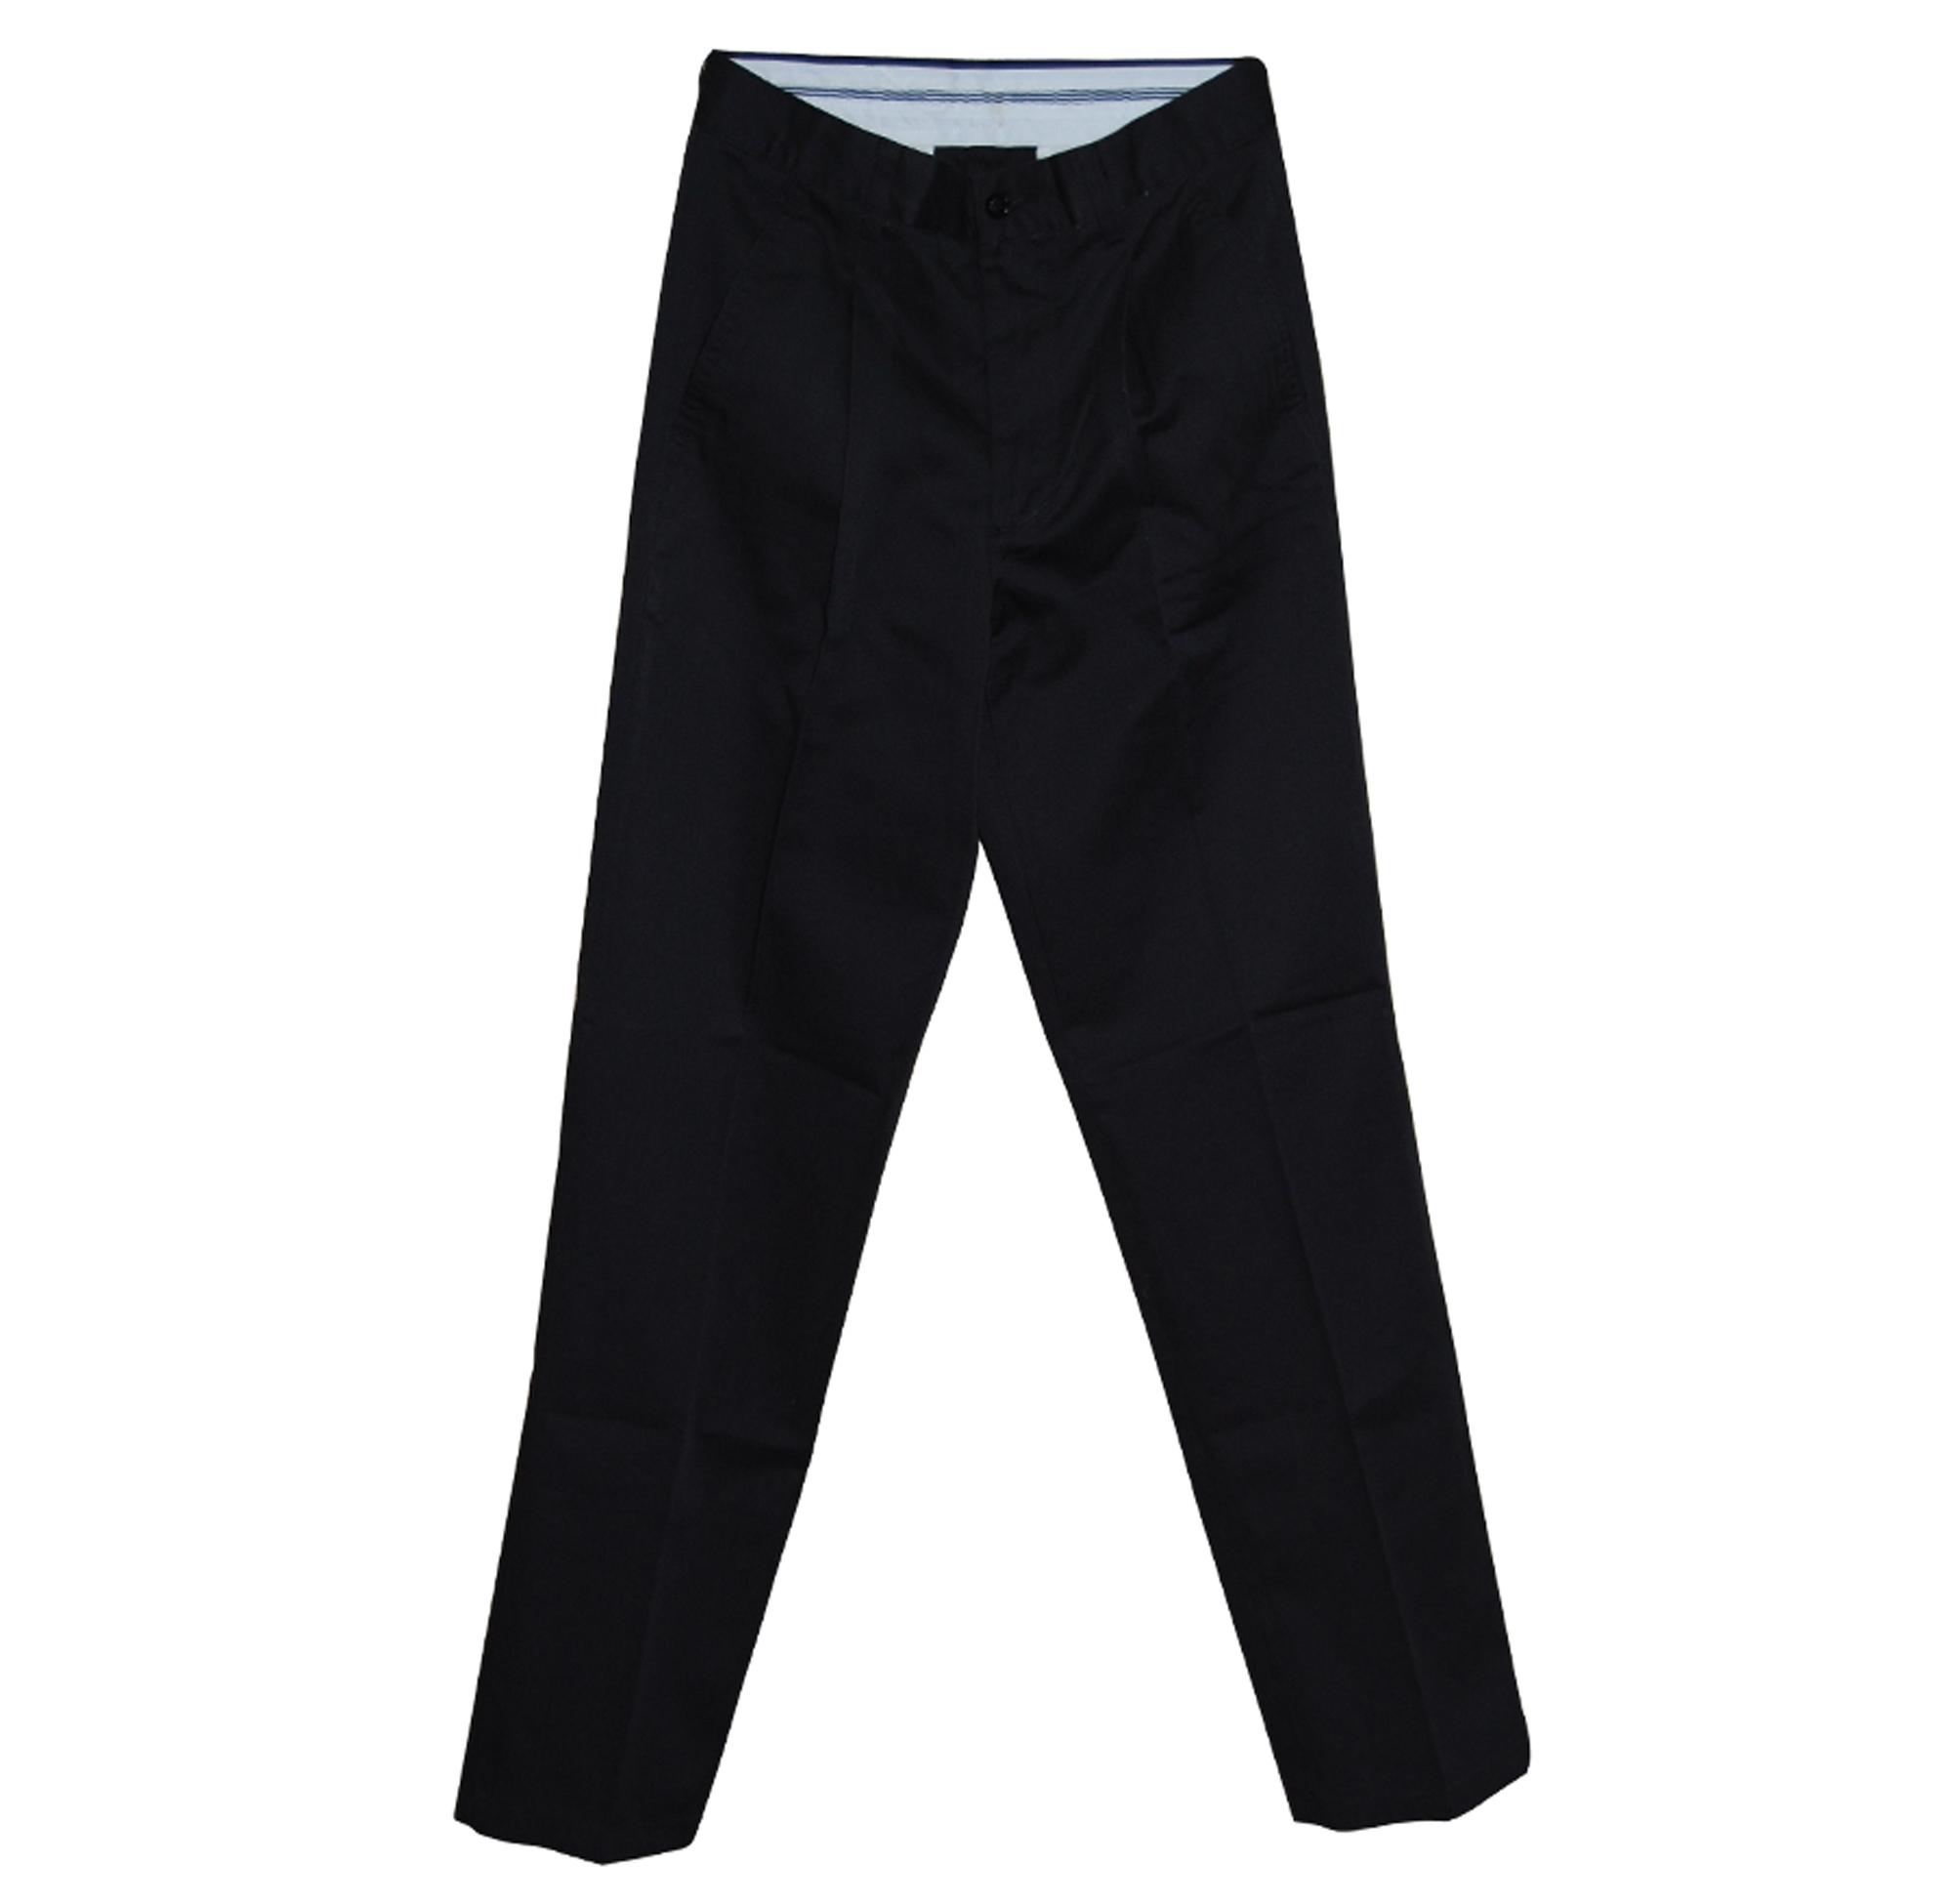 Pantalón Hombre Negro Tal